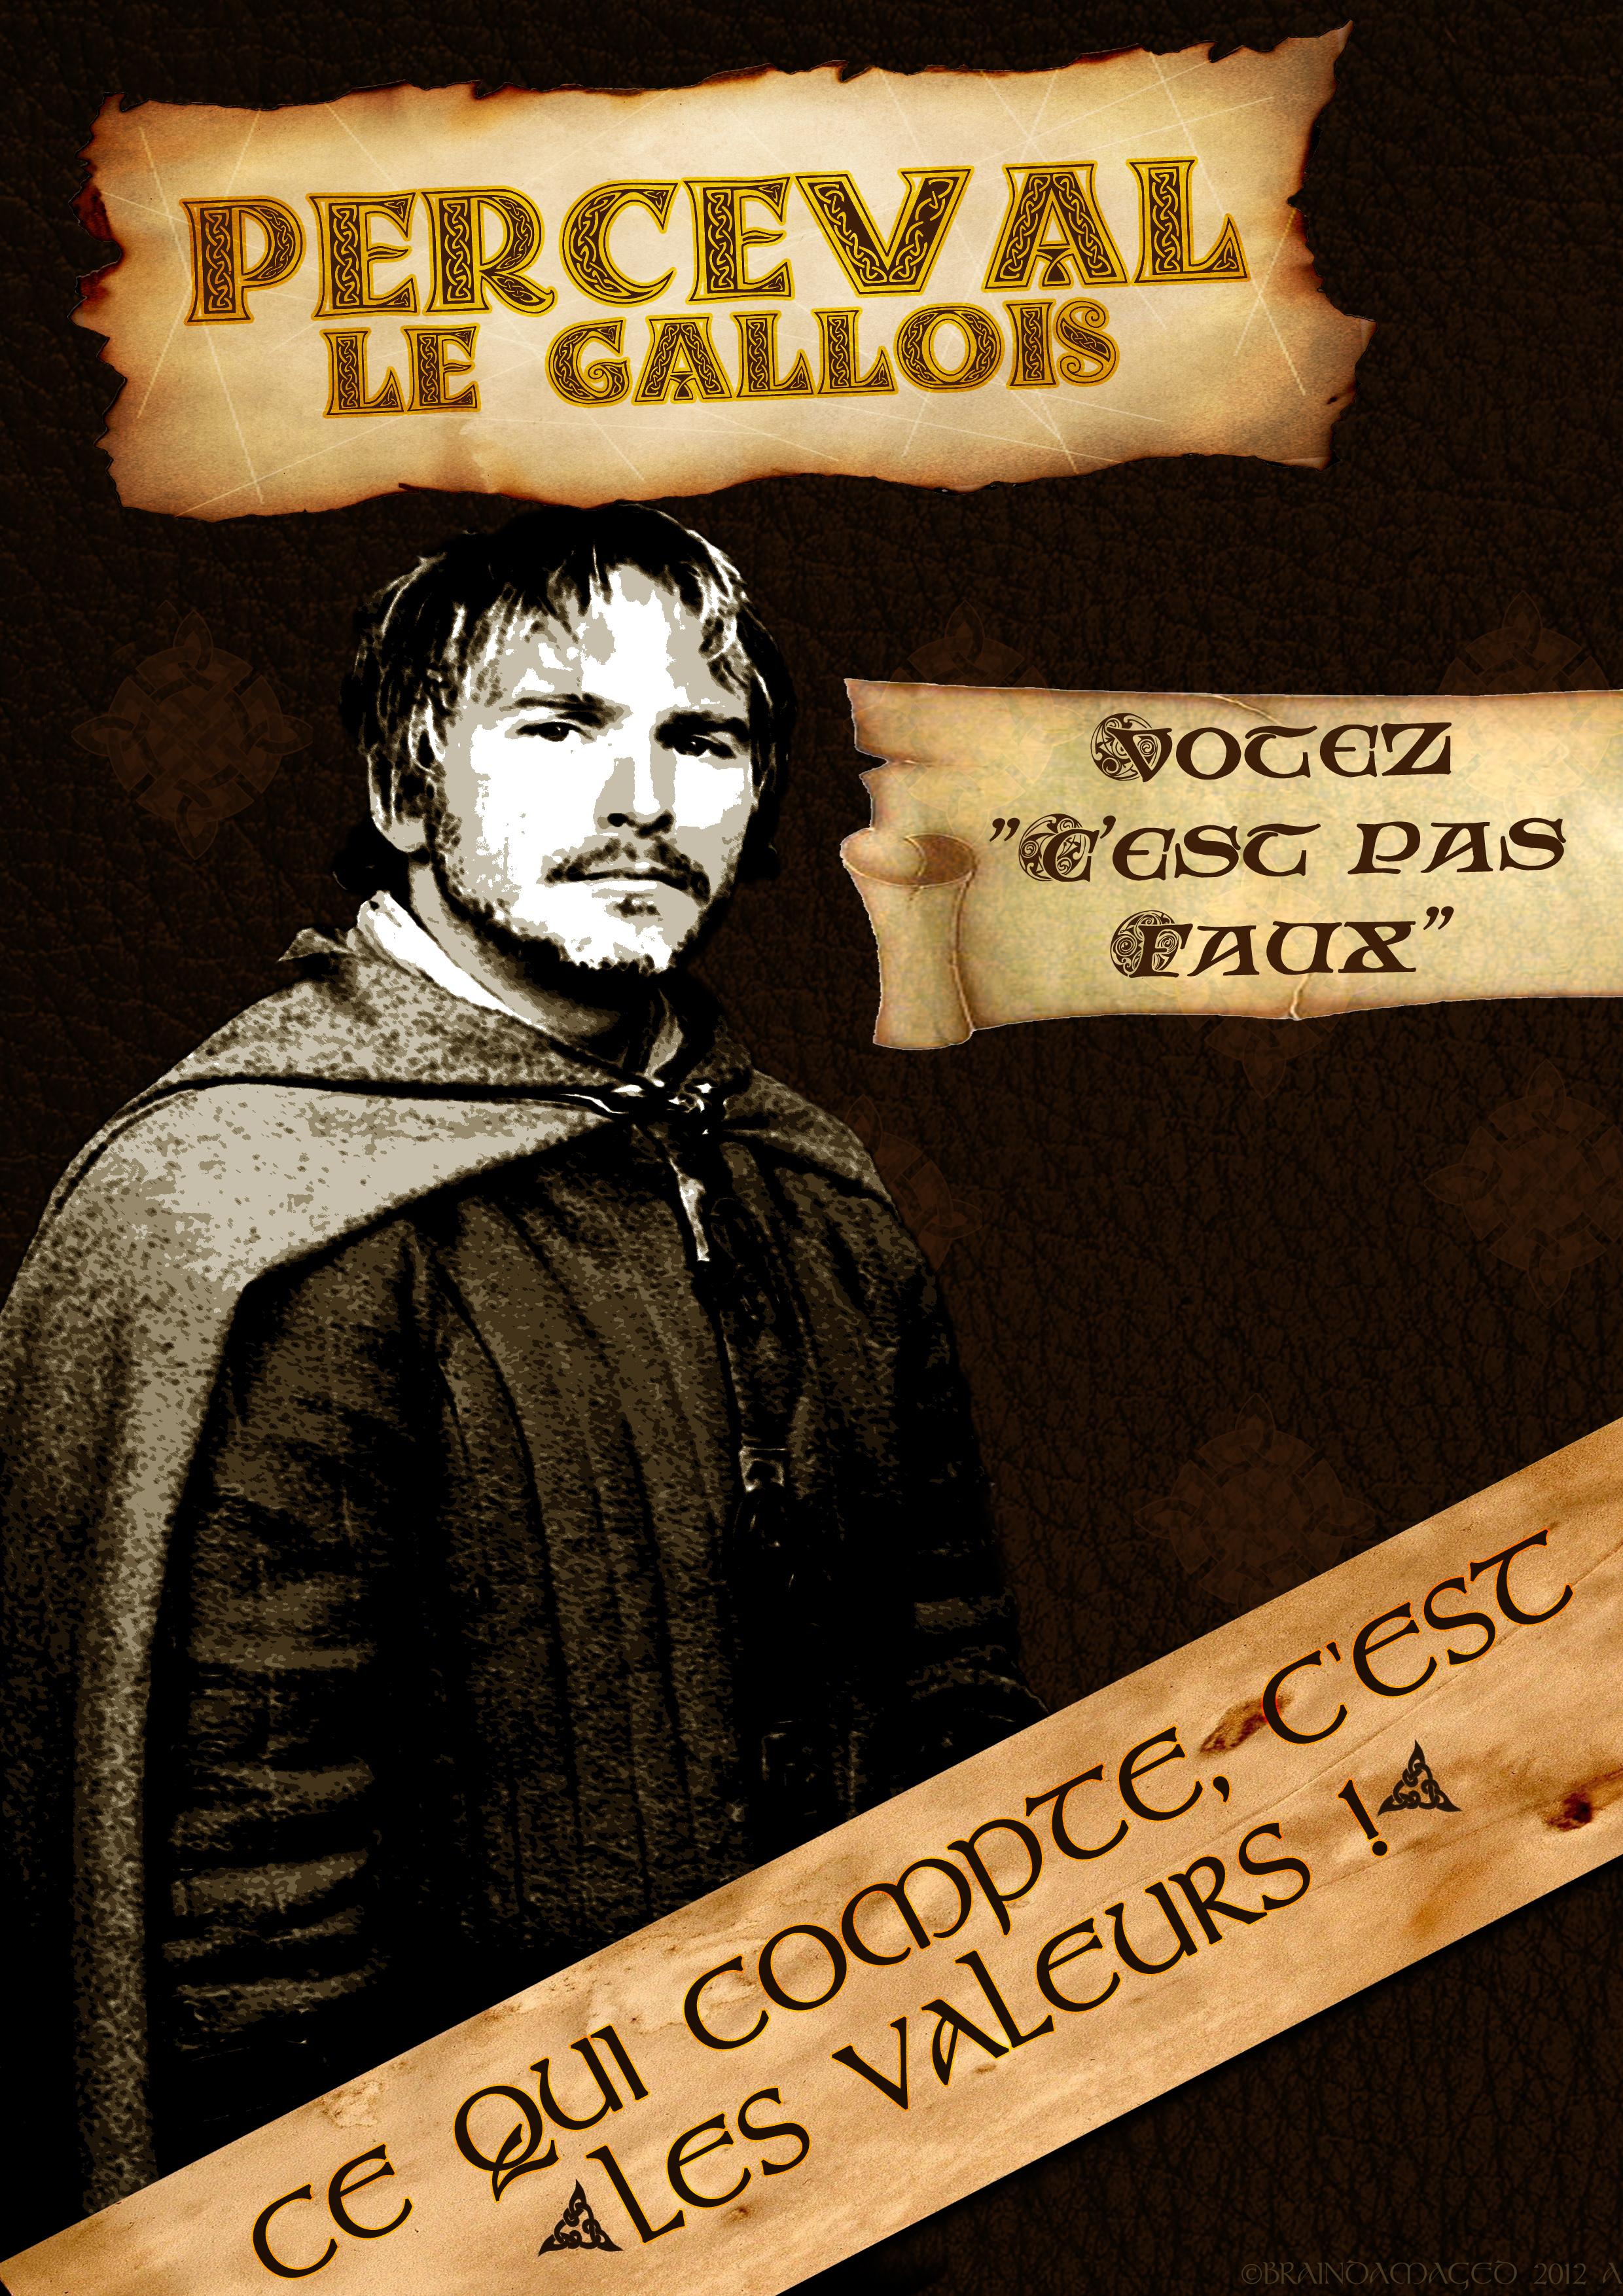 http://braindamaged.fr/wp-content/uploads/2012/03/perceval-le-gallois.jpg